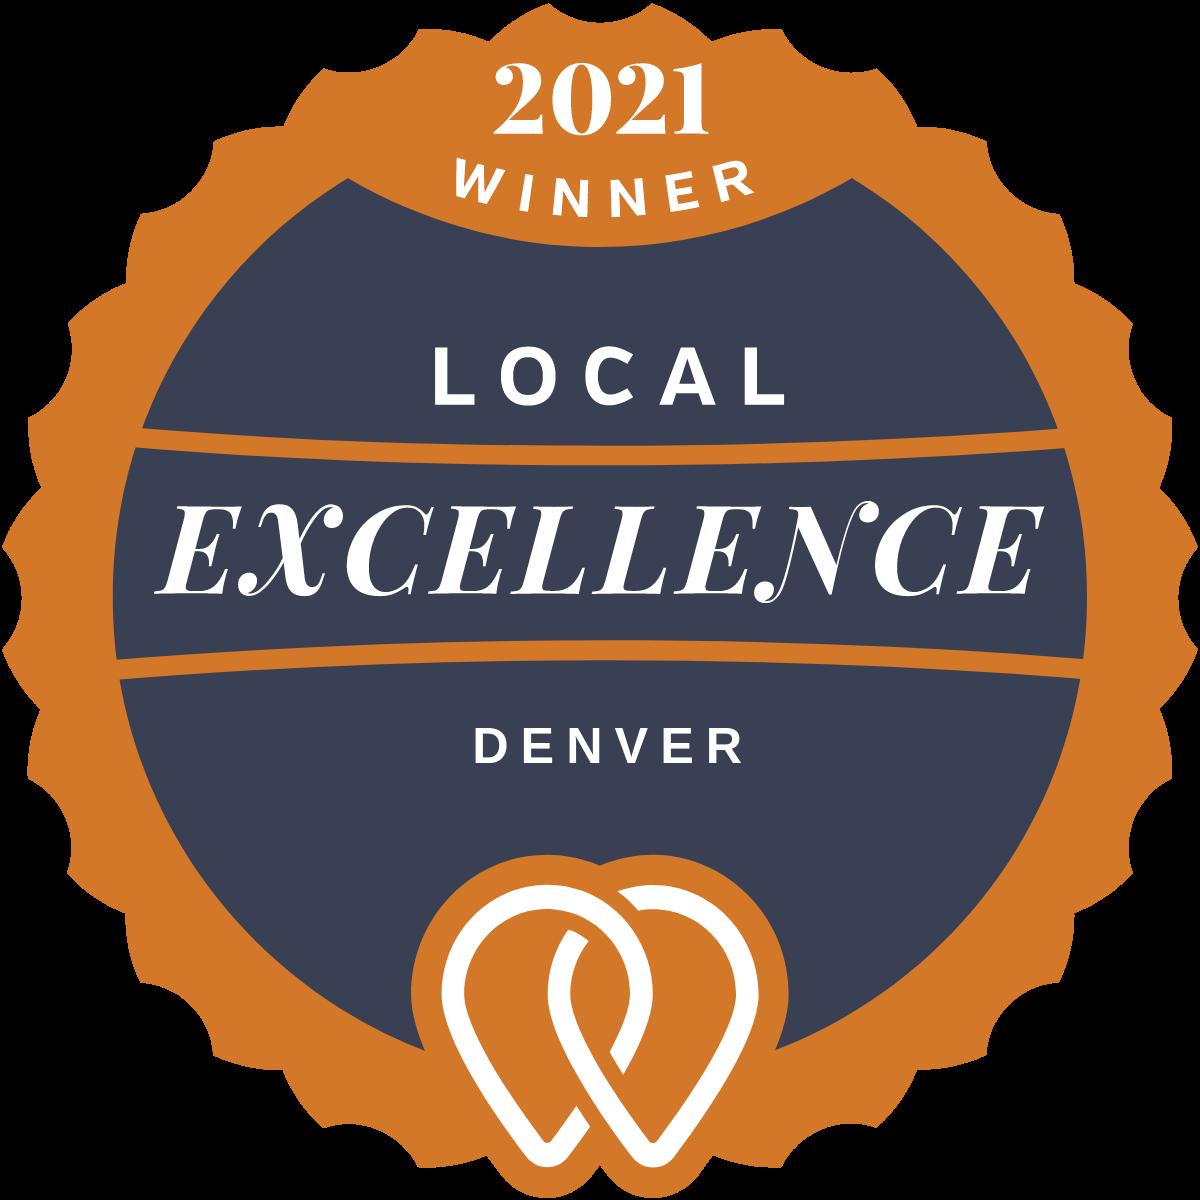 2021 Local Excellence Winner in Denver, CO